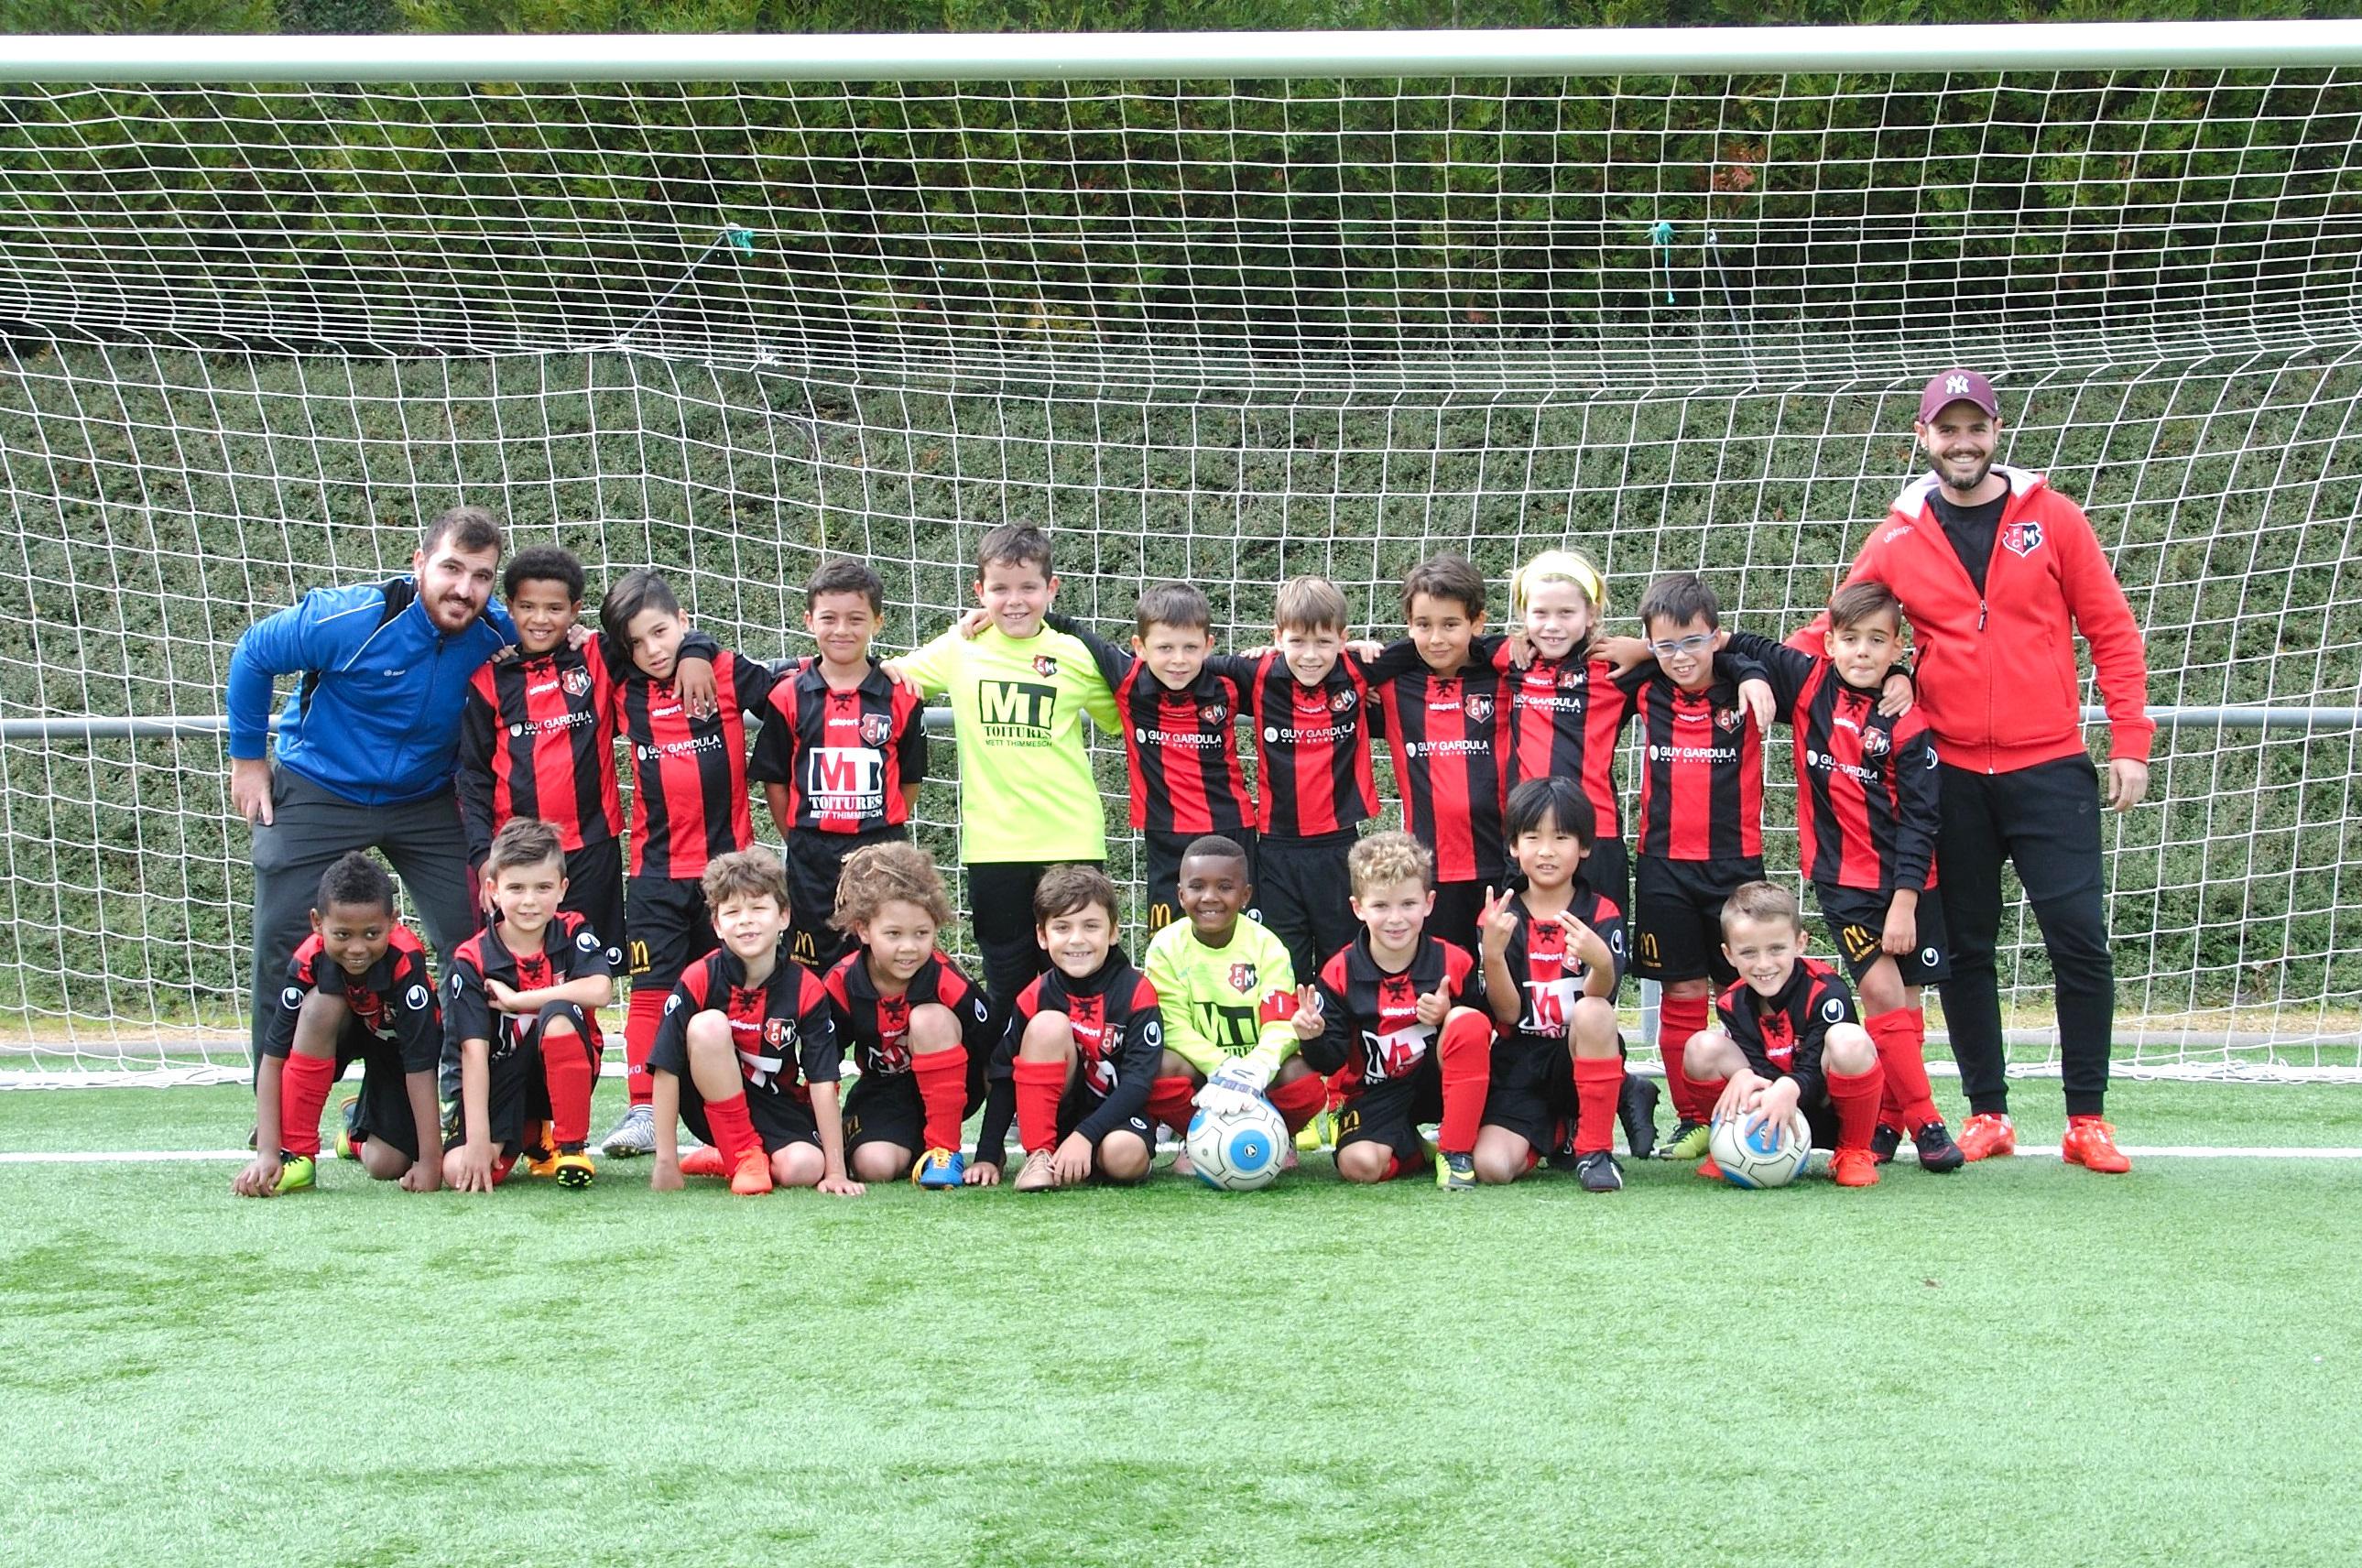 FC Mondercange Teamphoto